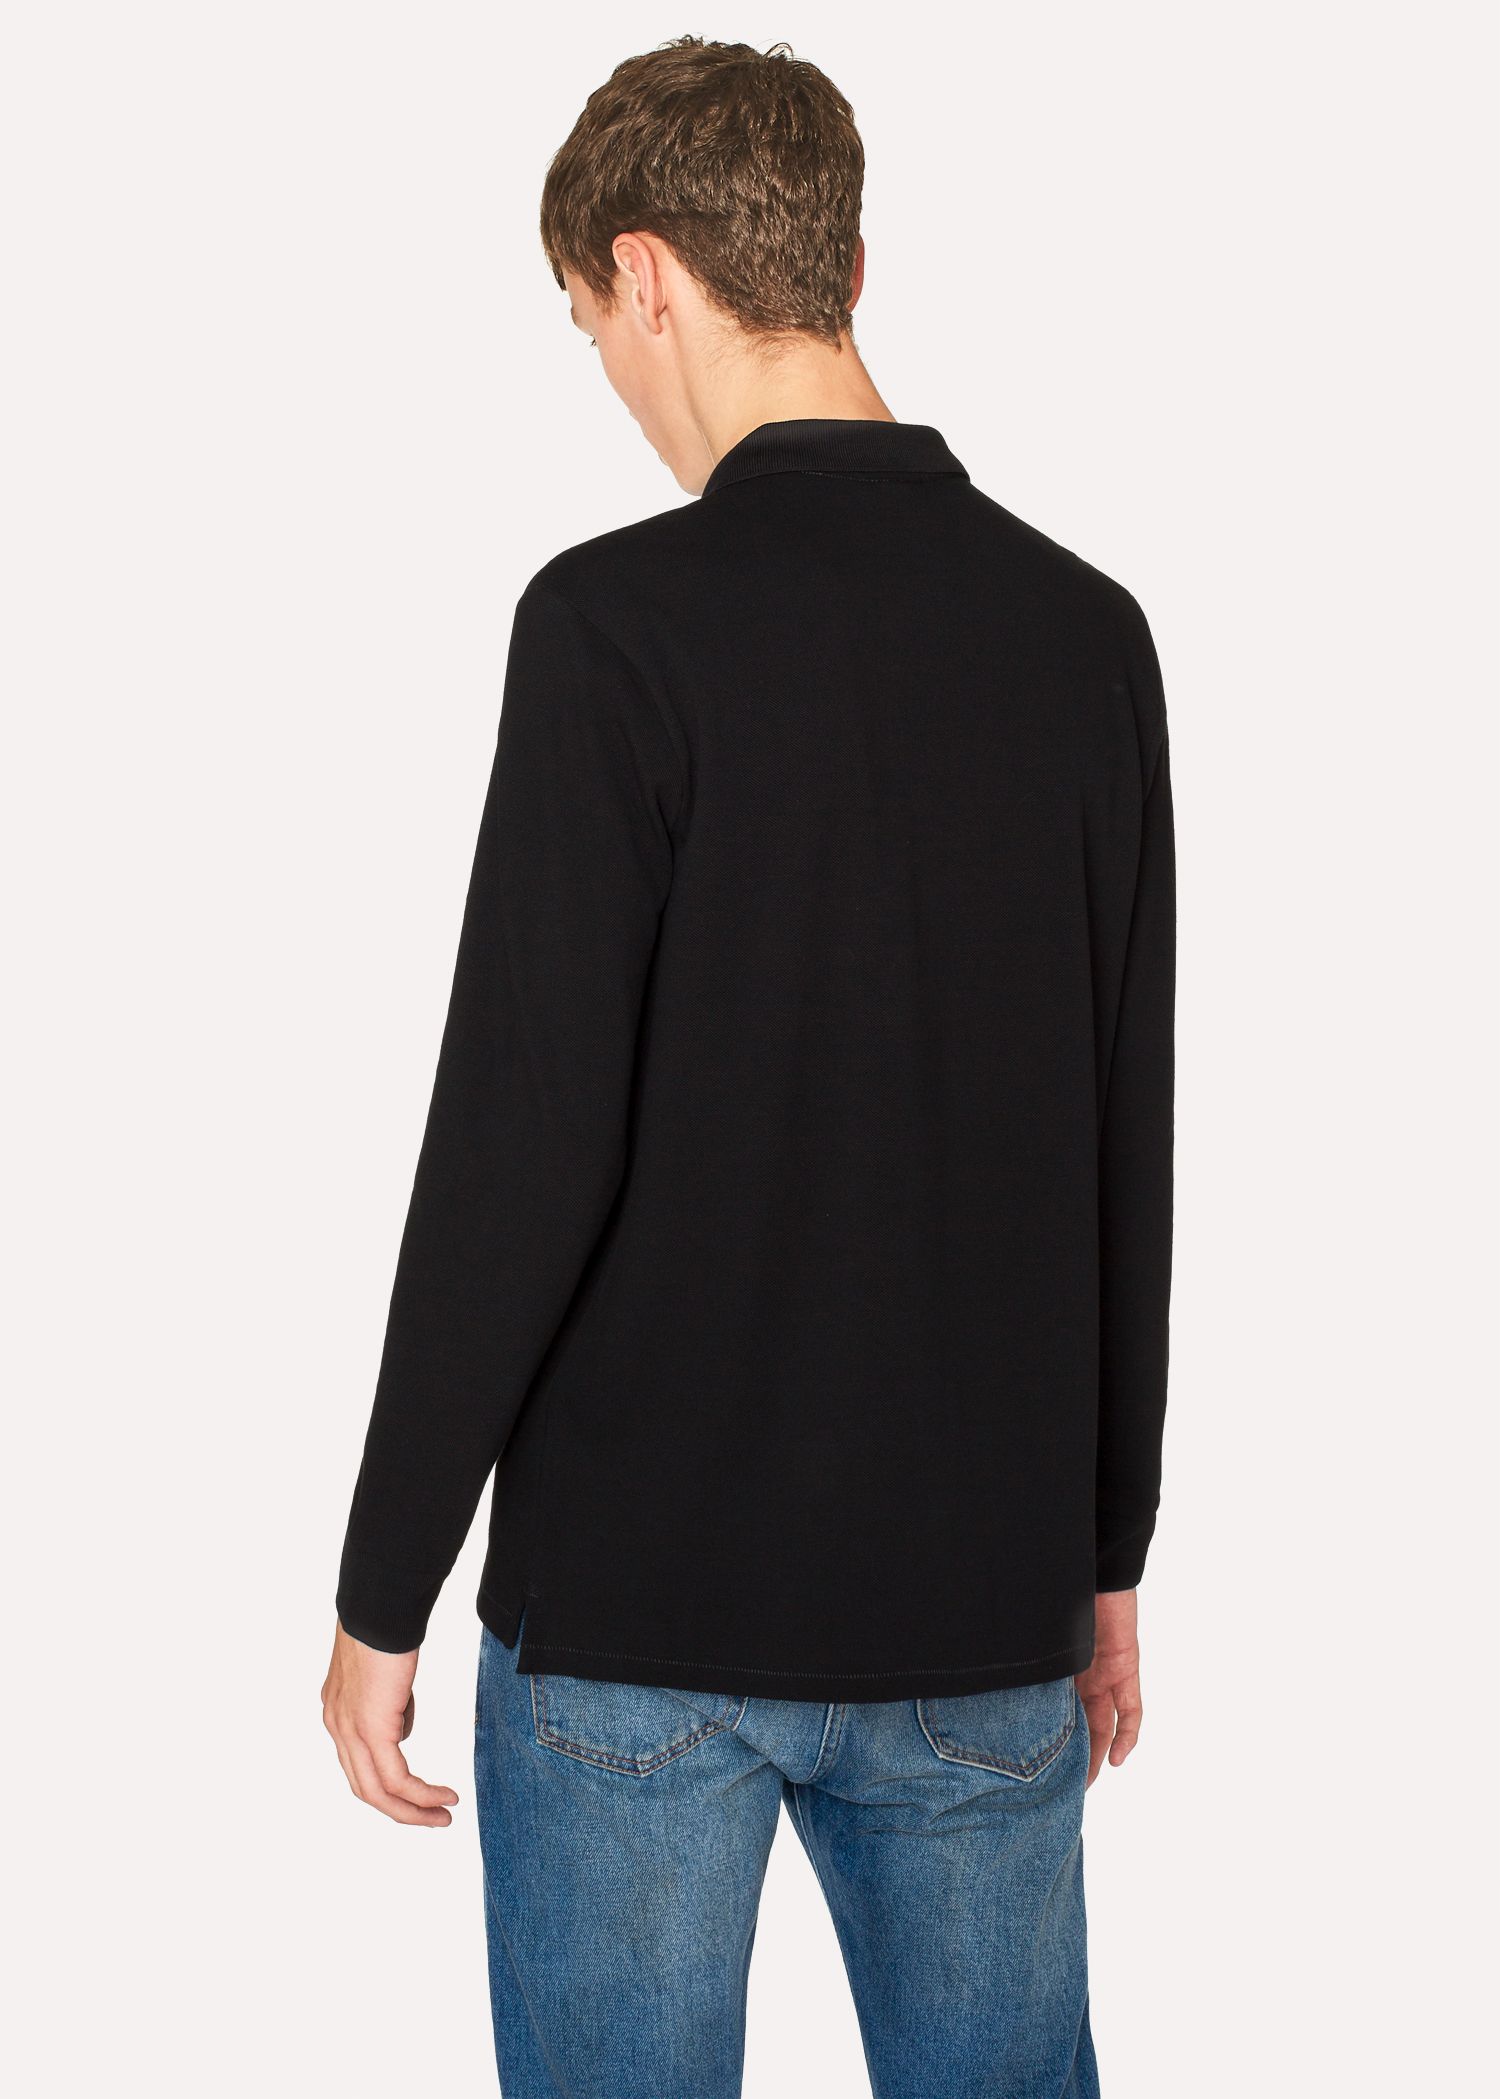 db7cd8f7a Men s Black Organic-Cotton Zebra Logo Long-Sleeve Polo Shirt - Paul ...